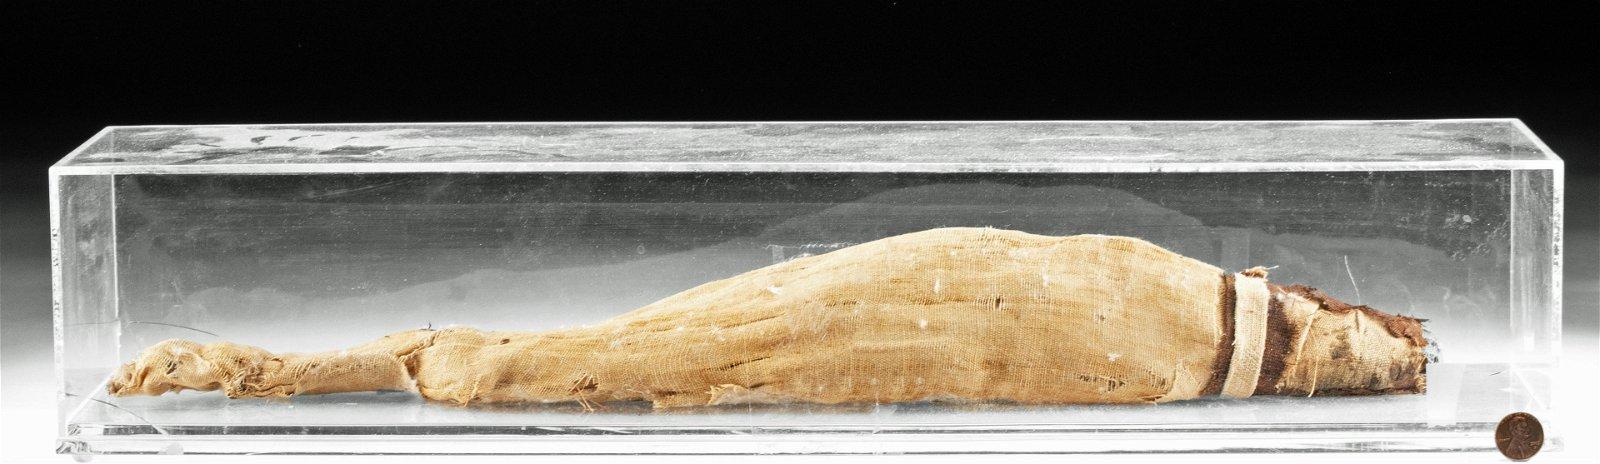 Rare Egyptian Mummy of Fish - Nile Perch w/ X-Ray